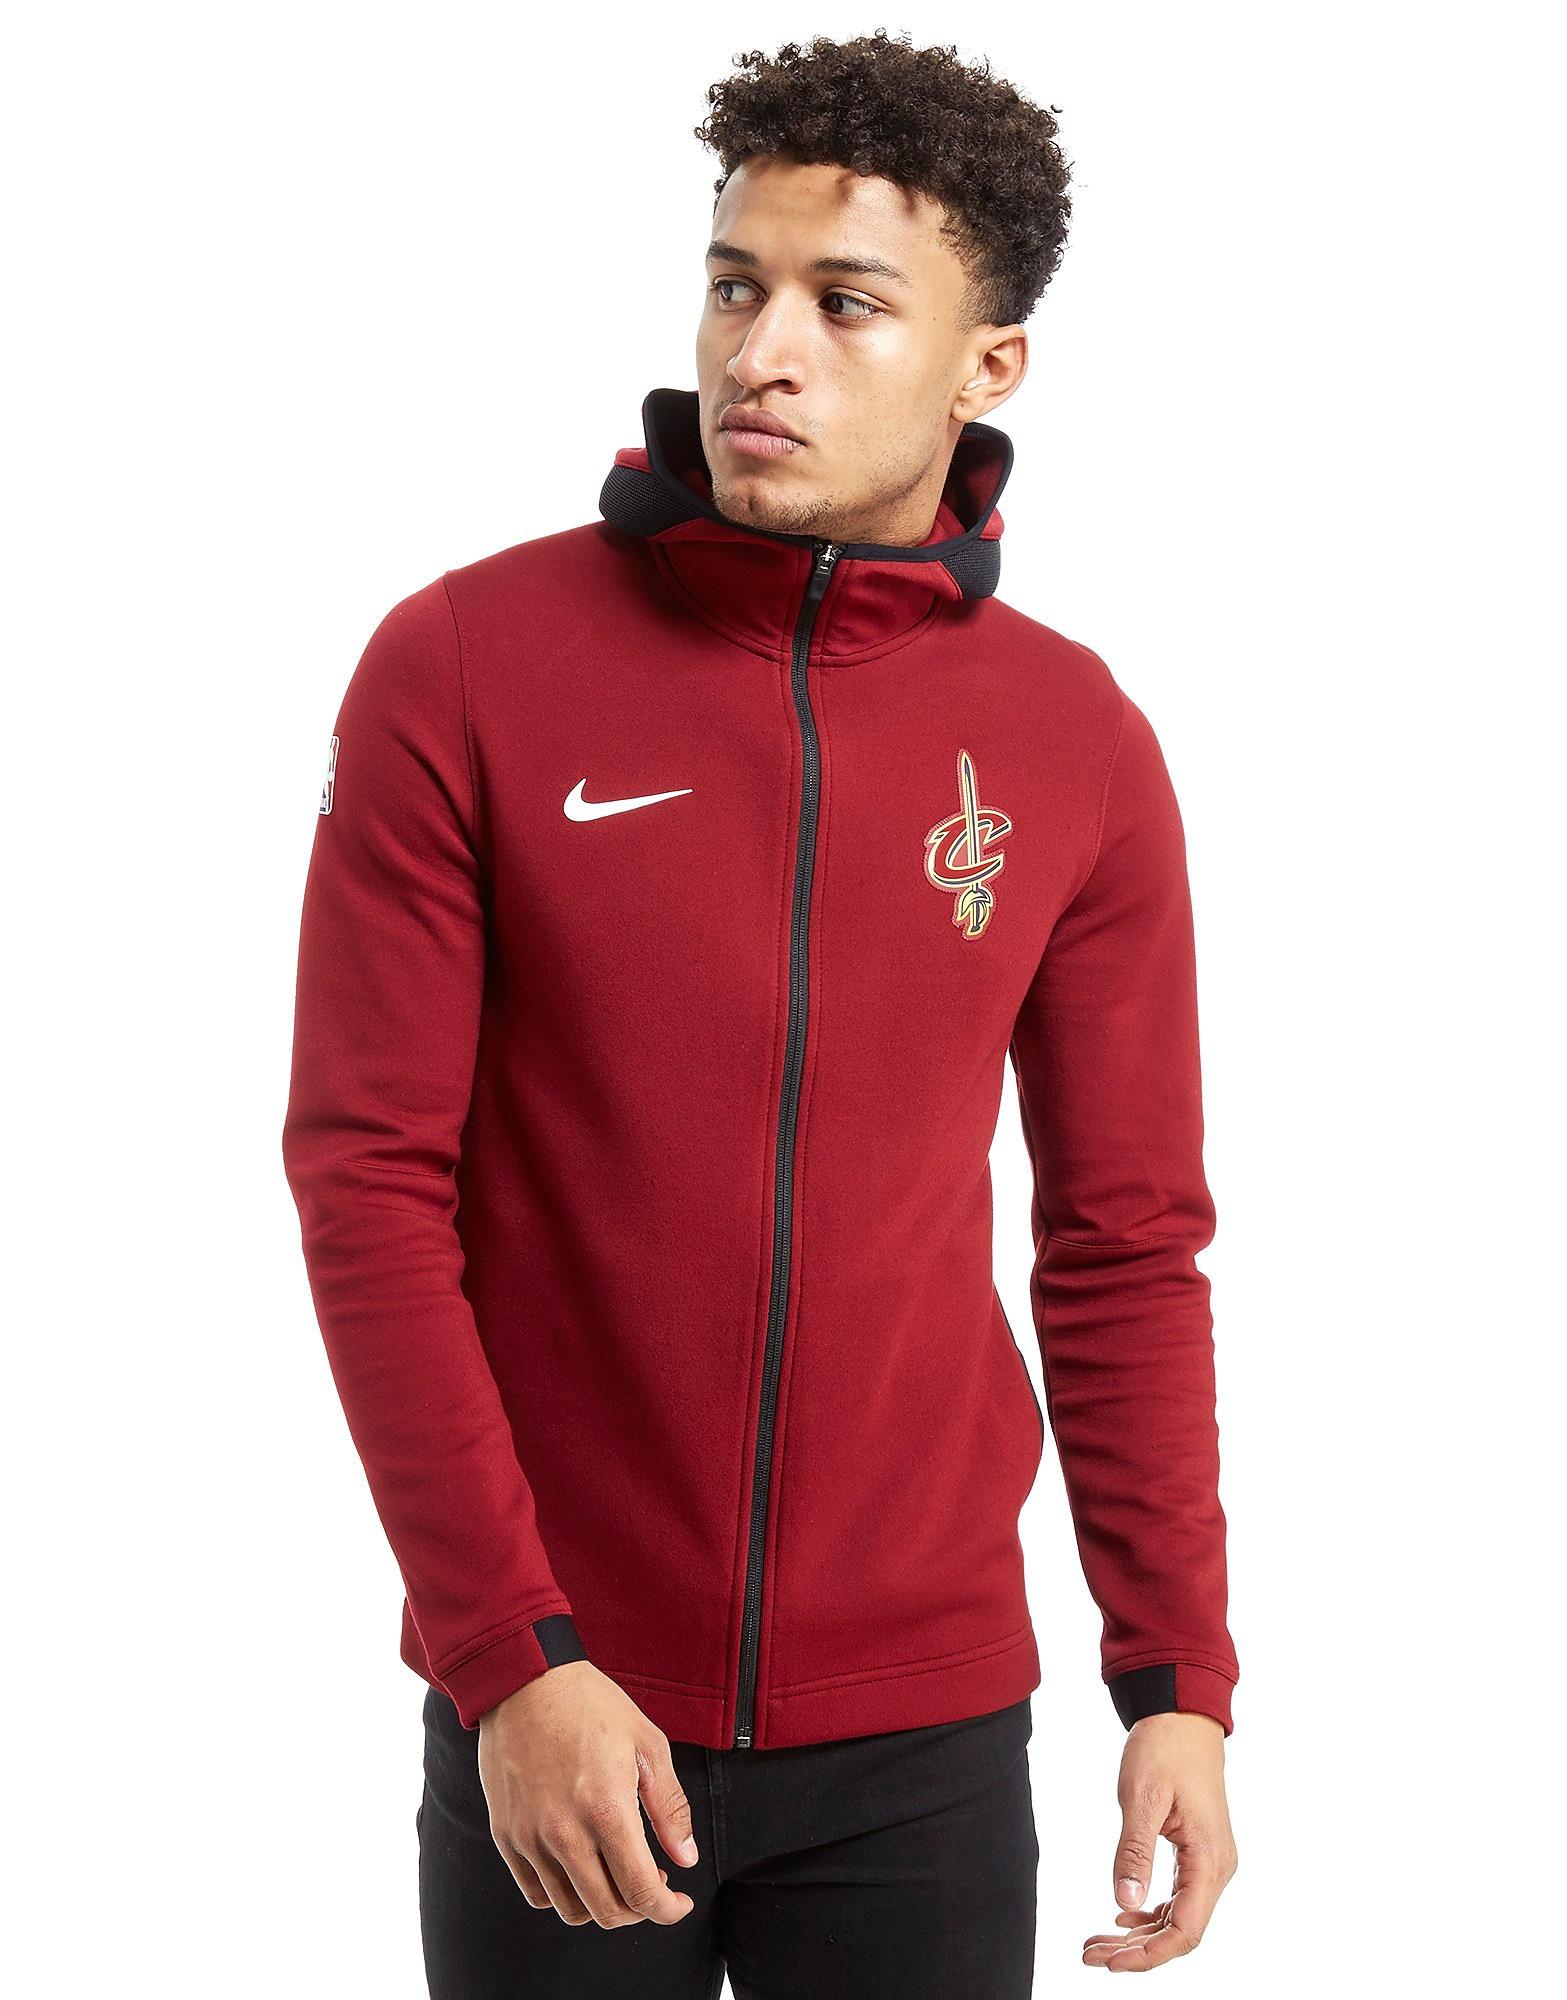 Nike chaqueta con capucha NBA Cleveland Cavaliers